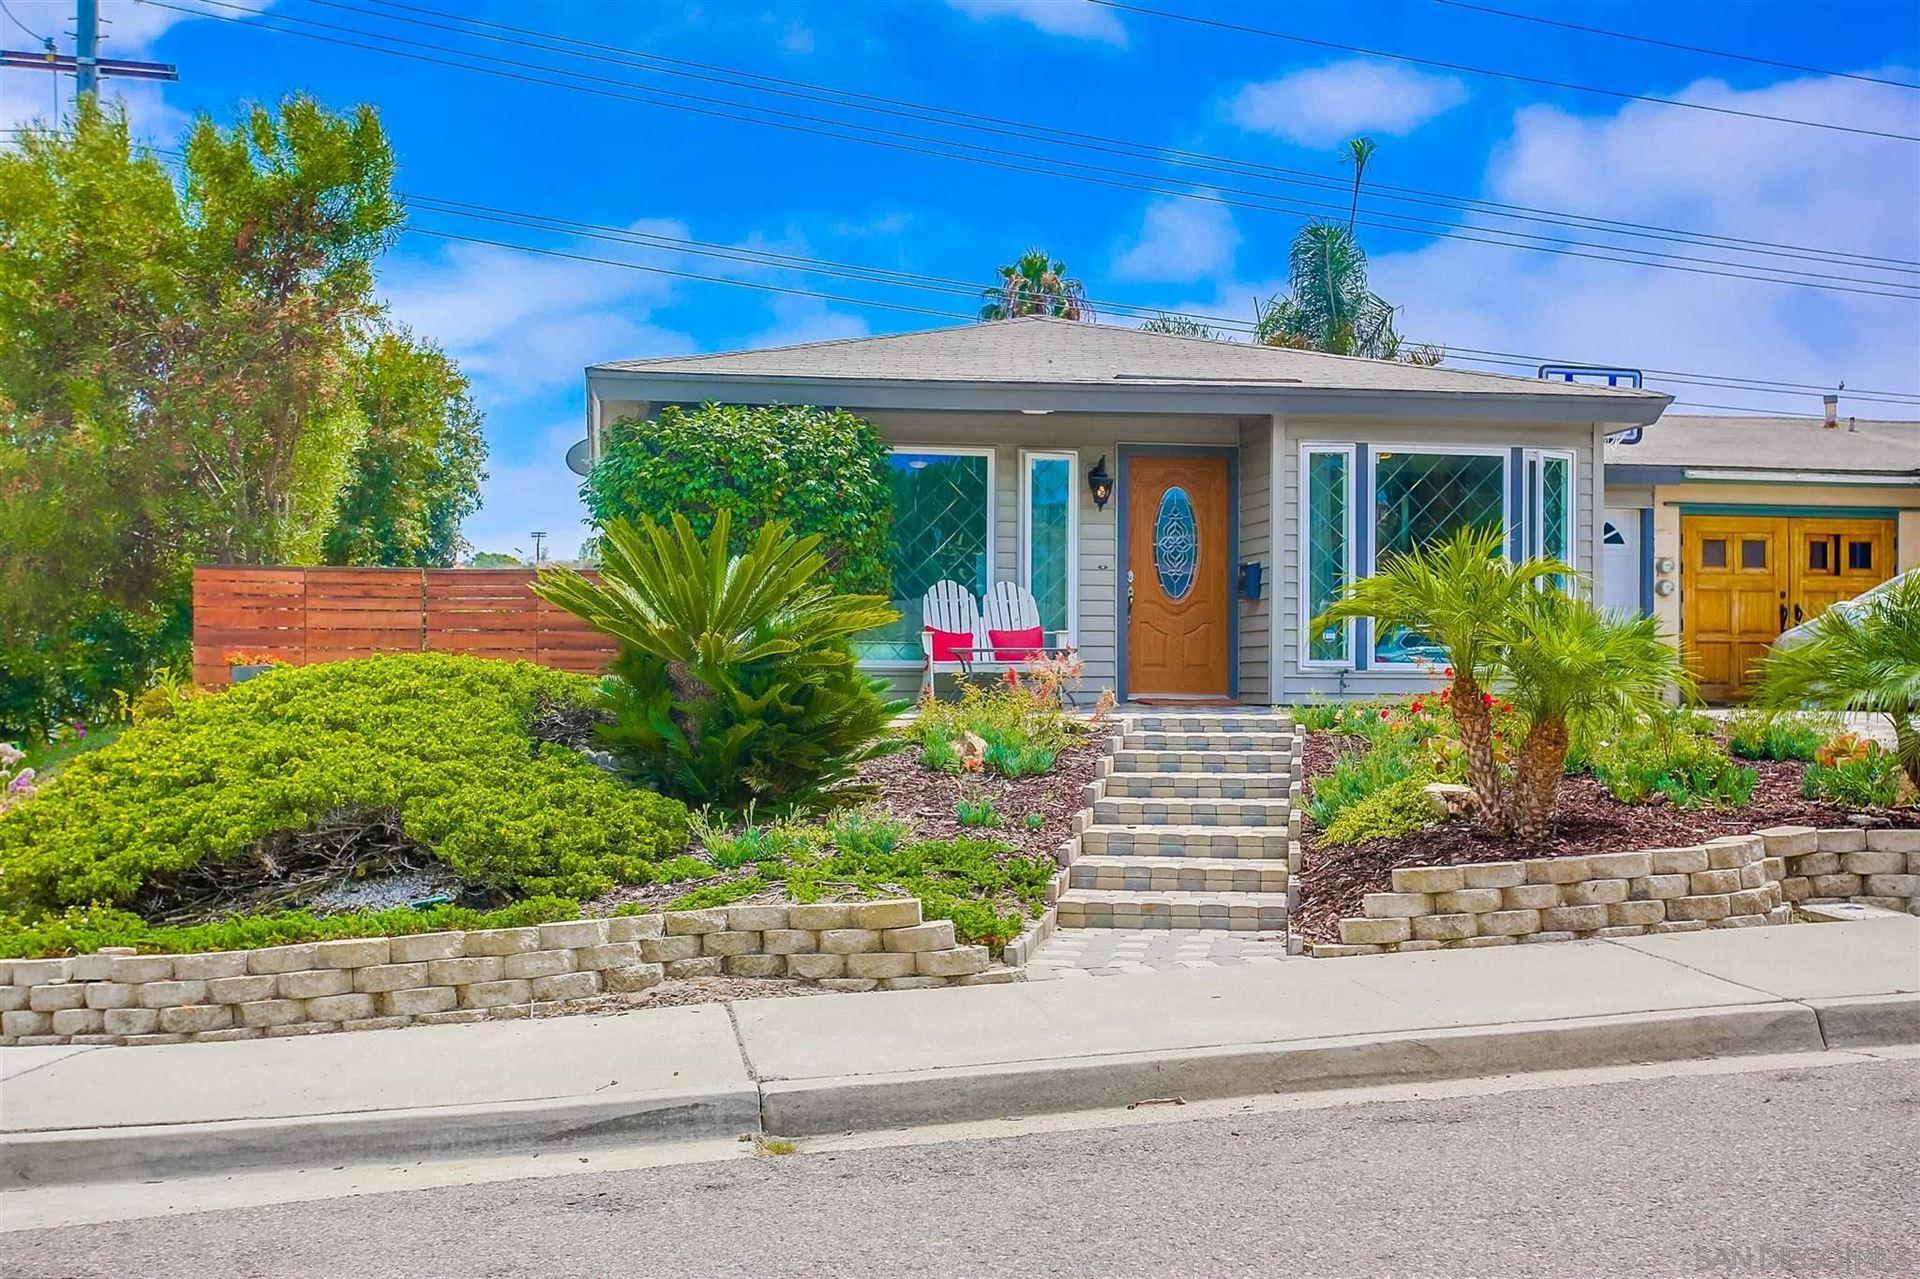 Photo of 751 Sunflower St, Encinitas, CA 92024 (MLS # 210021279)